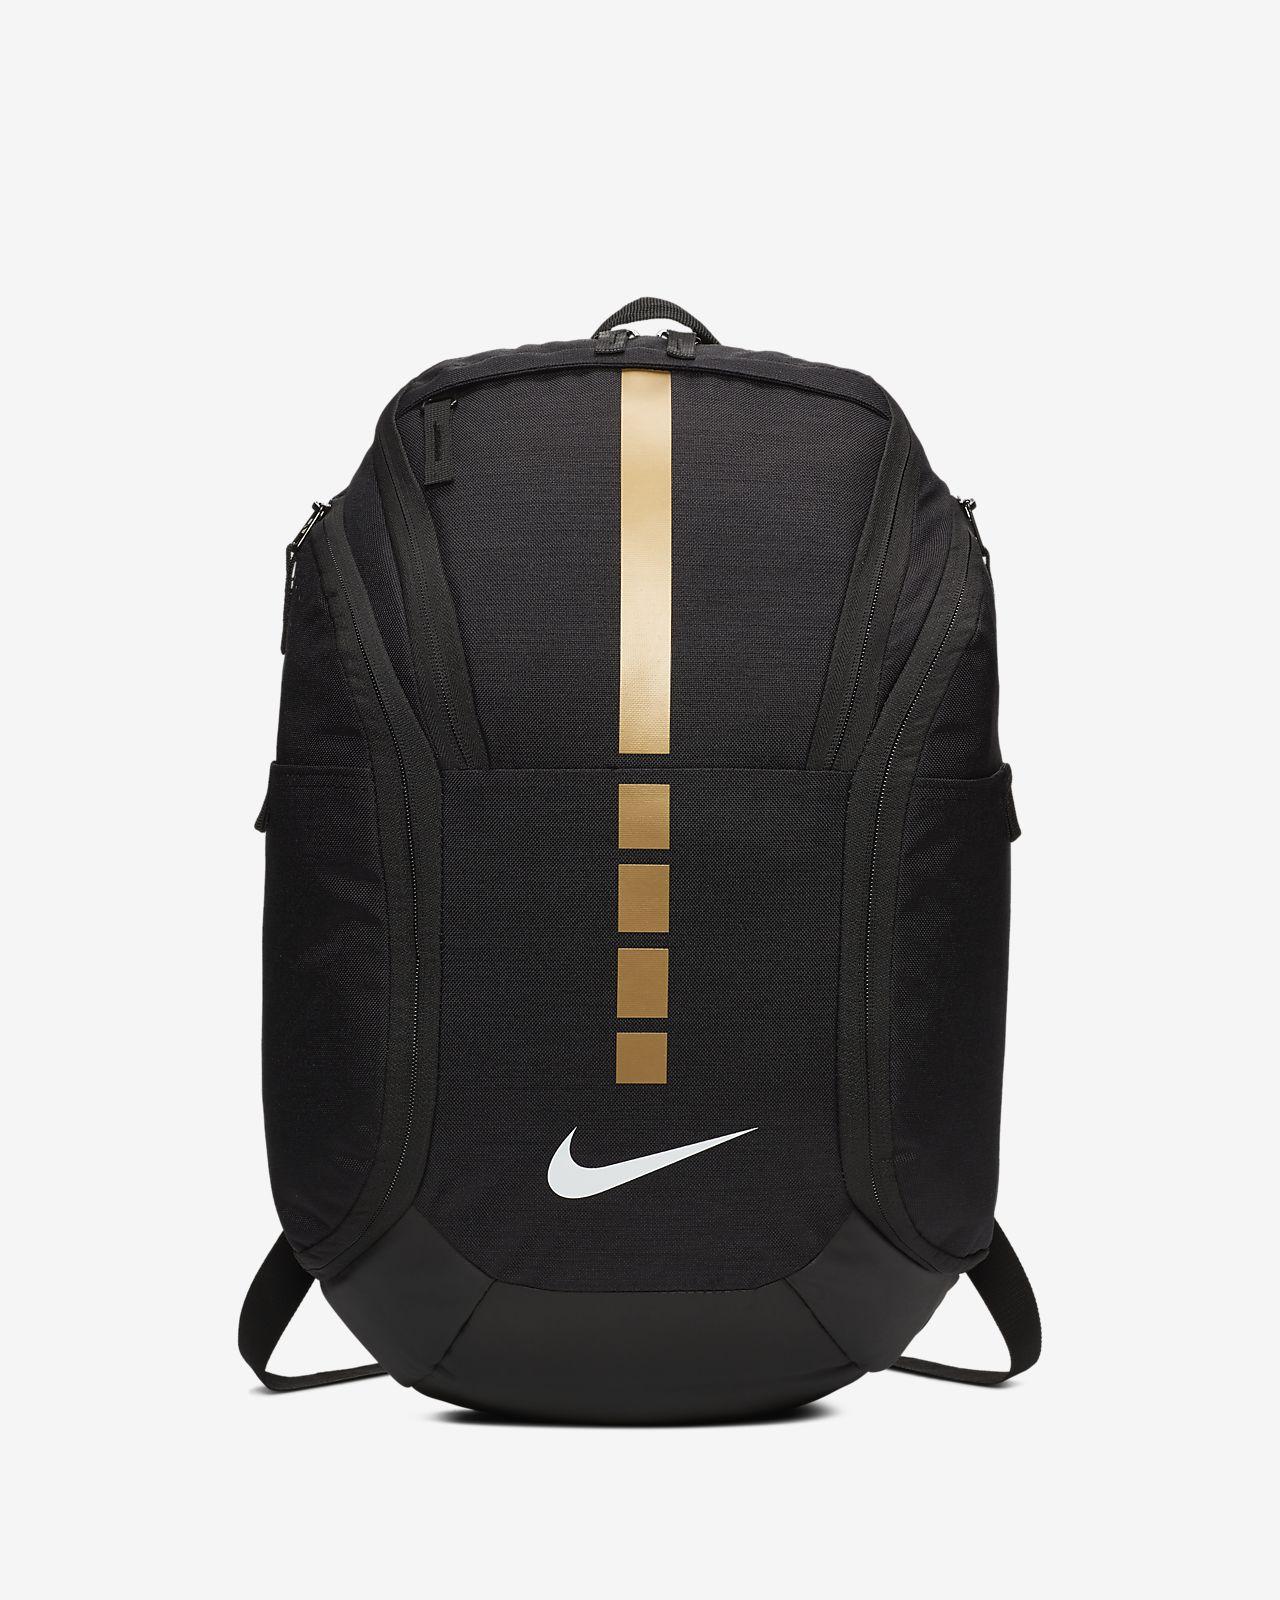 Mochila de básquetbol Nike Hoops Elite Pro (pequeña)